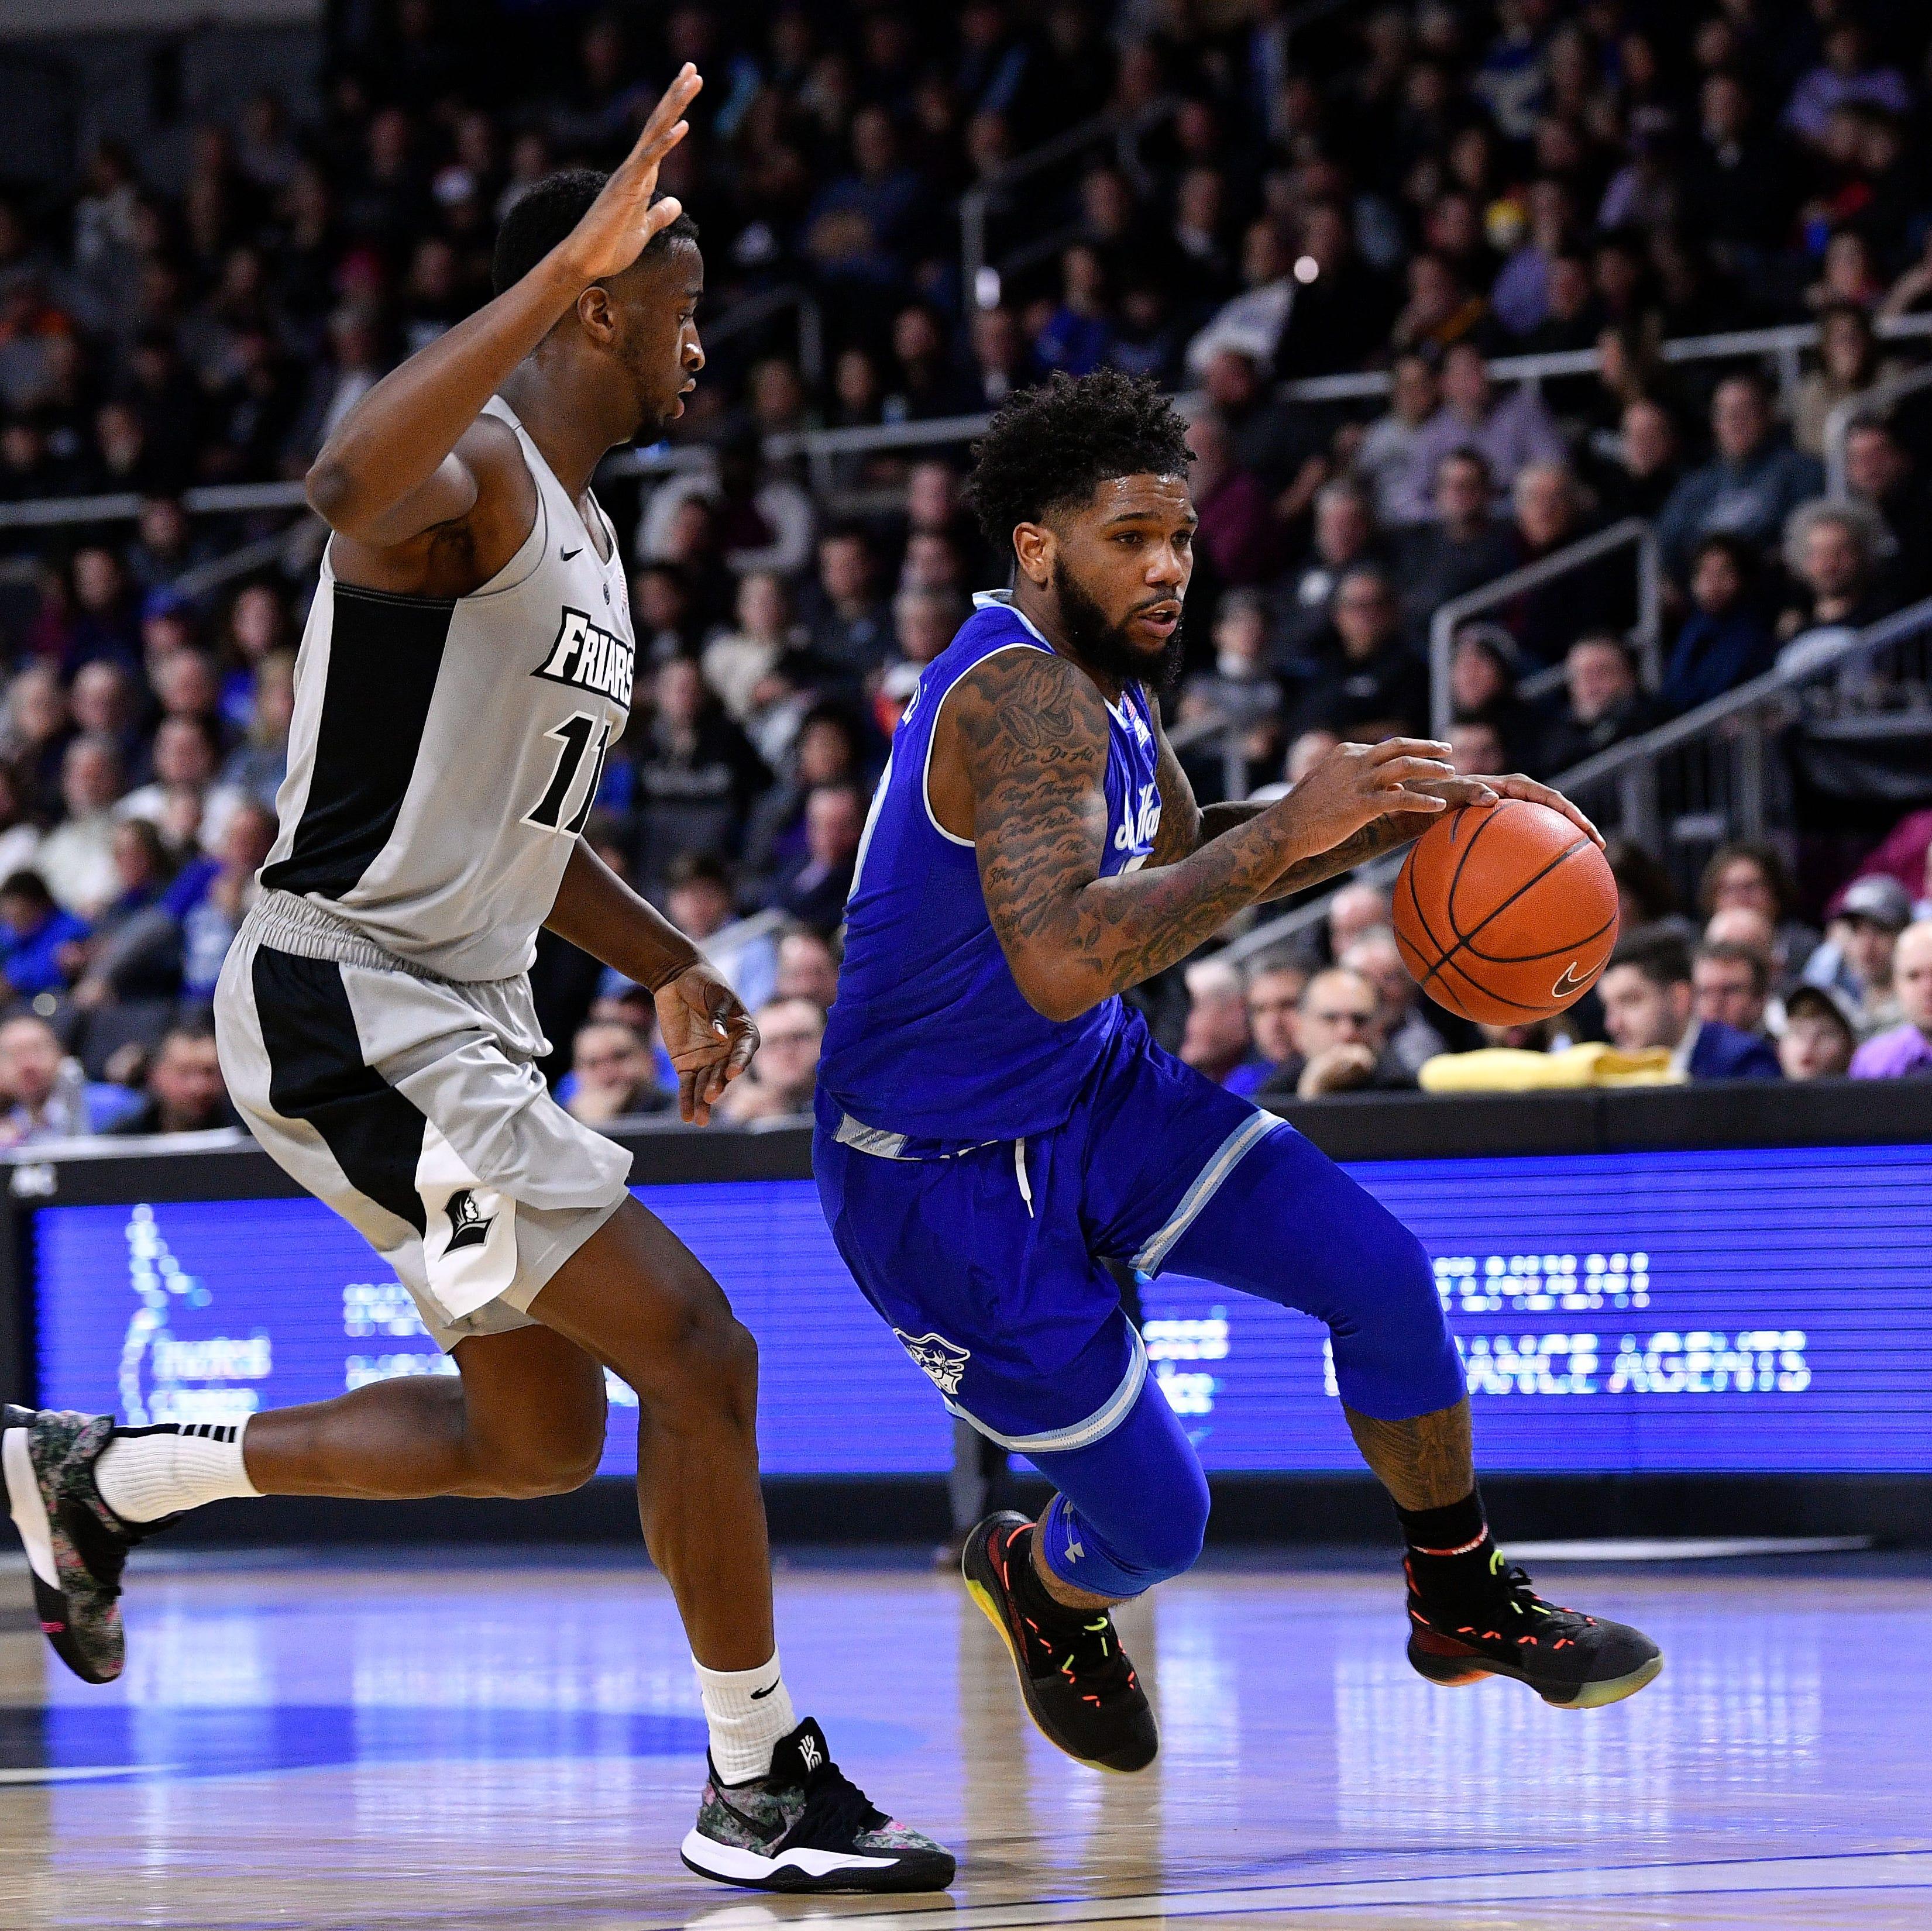 Seton Hall basketball's offense implodes at Providence